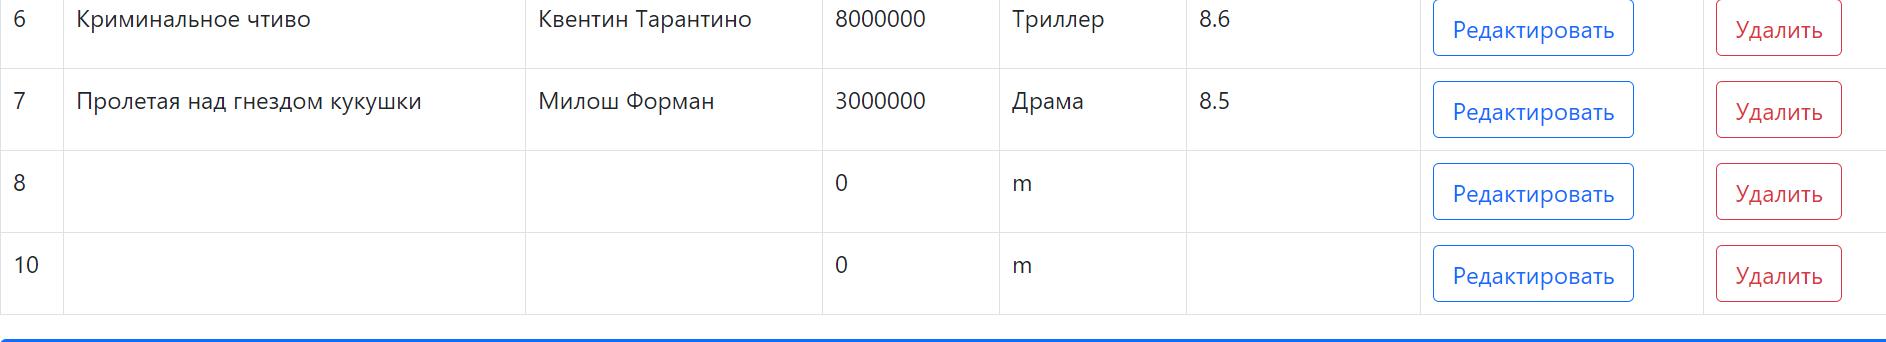 5fc0aeacba486596169908.png